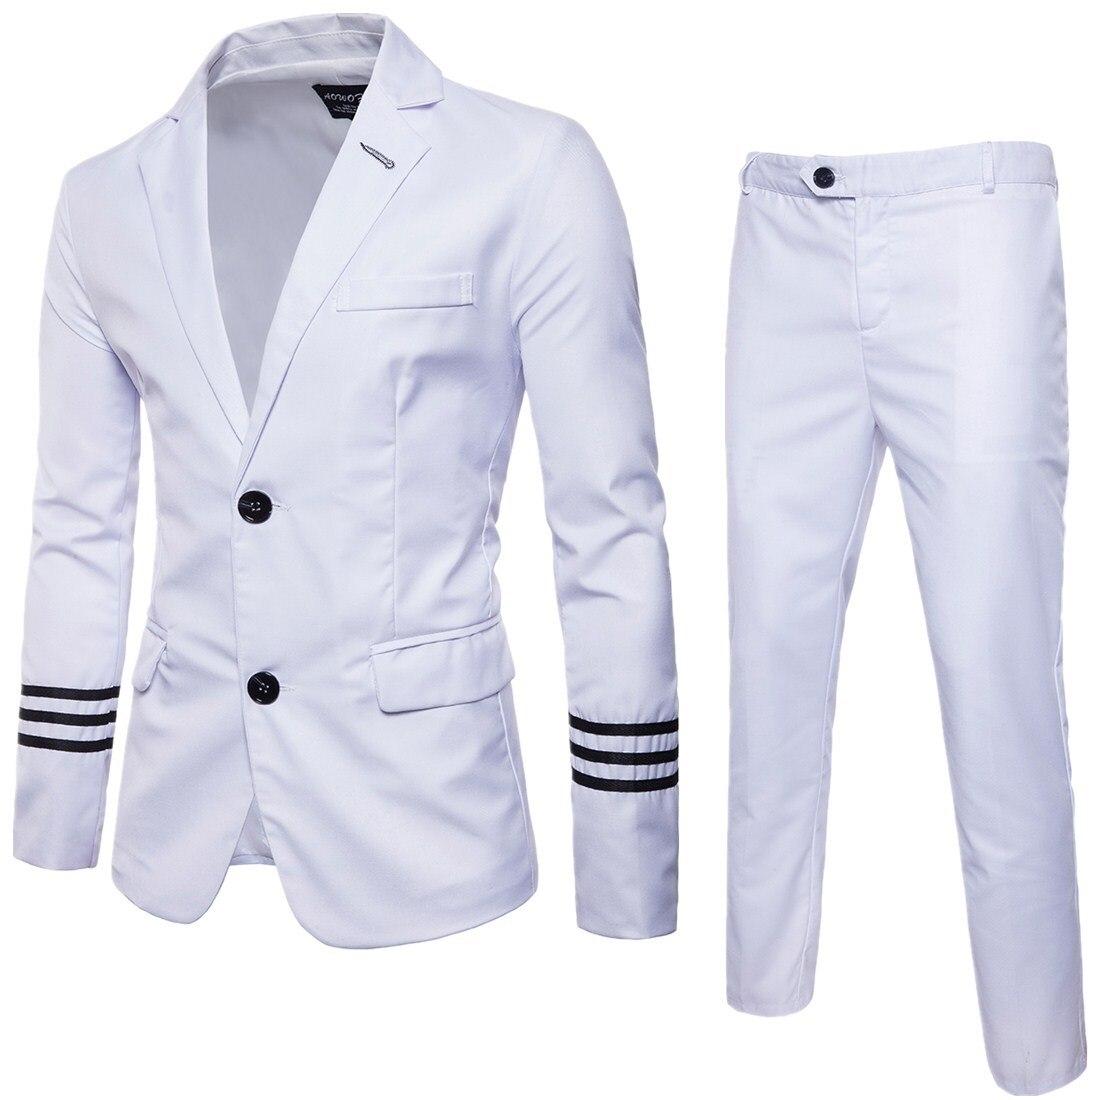 2017 Autumn Clothing Quality Business Leisure Suit Two-Piece Set Groom Best Man Wedding One-Button Suit Set Y909